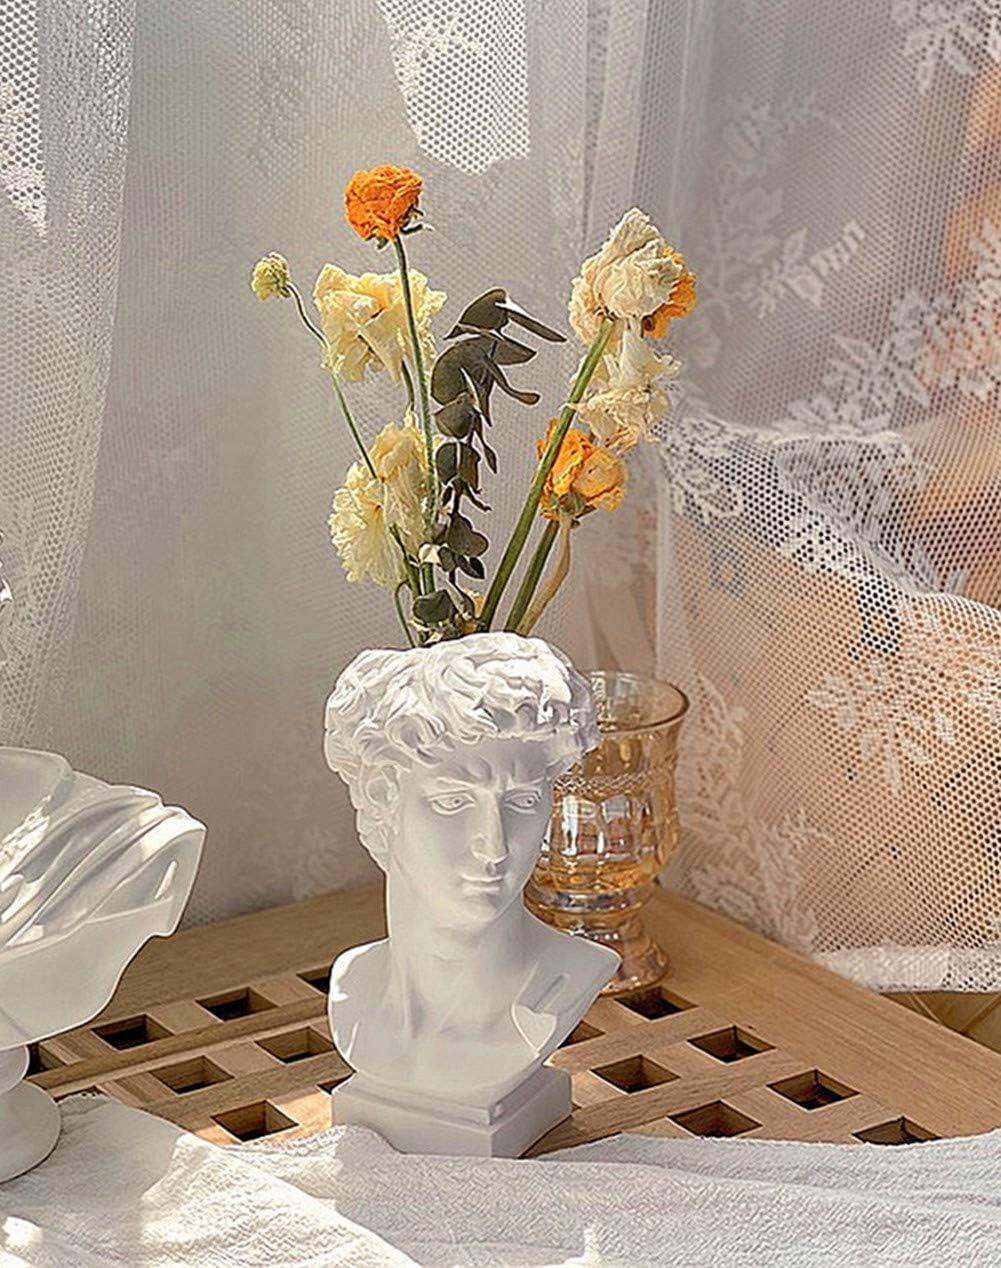 Shop FunSpace Greek Roman Style Statue Flowers Vase from Amazon on Openhaus